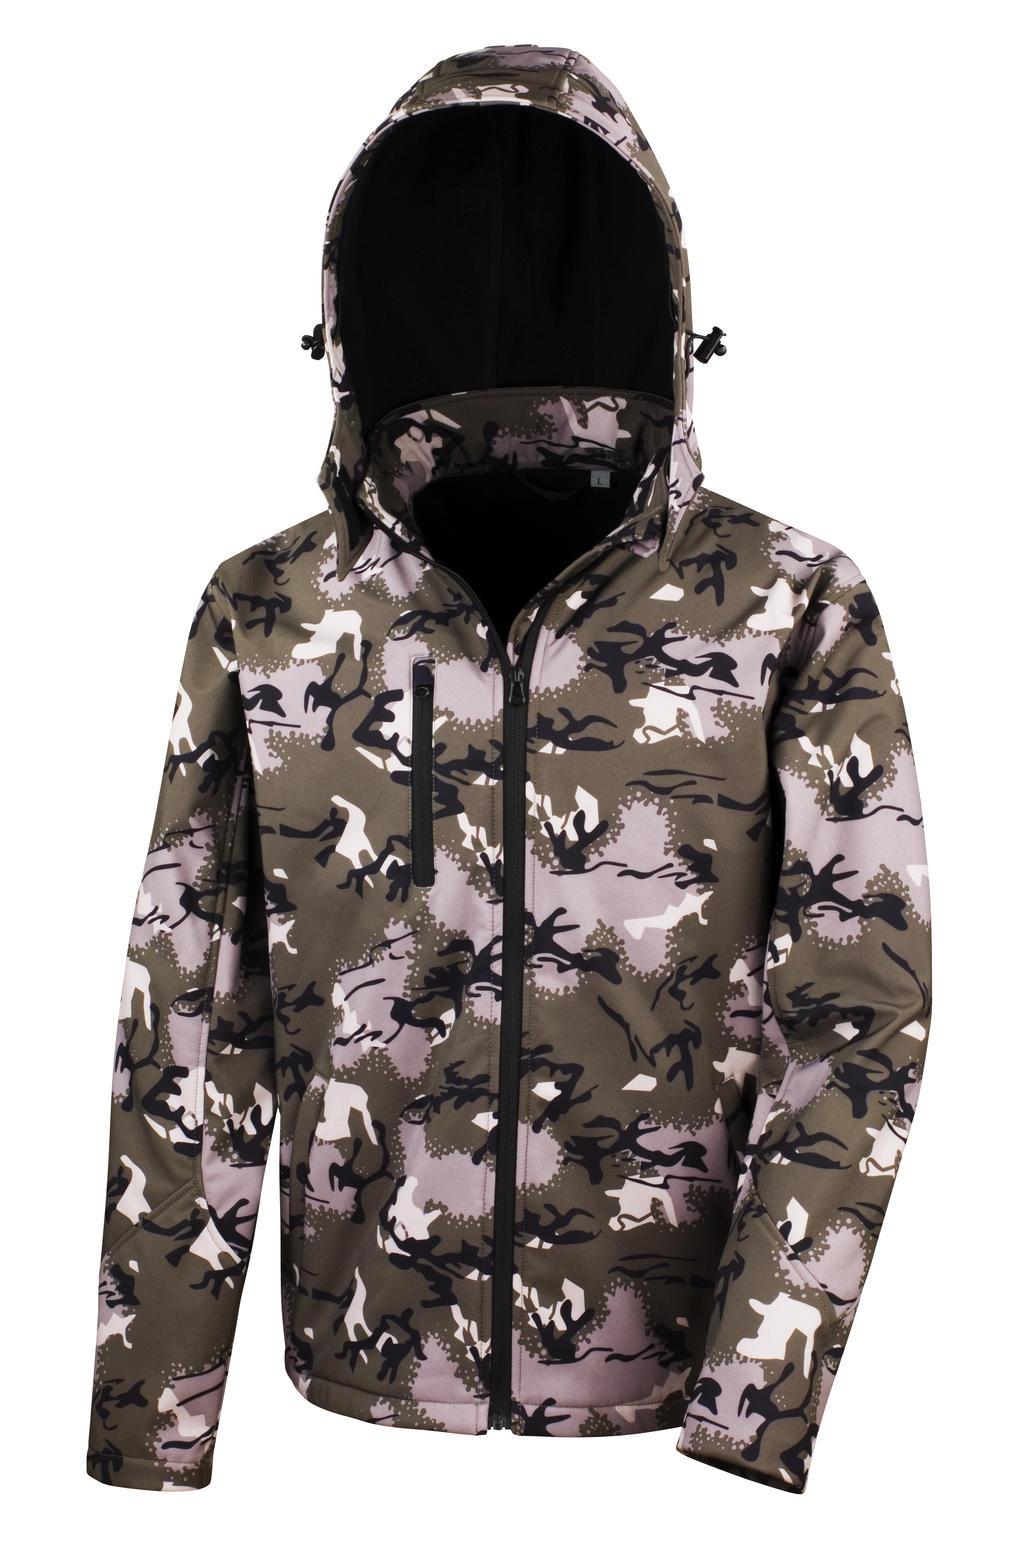 Softshell bunda Camo TX Performance s kapucí - zvìtšit obrázek